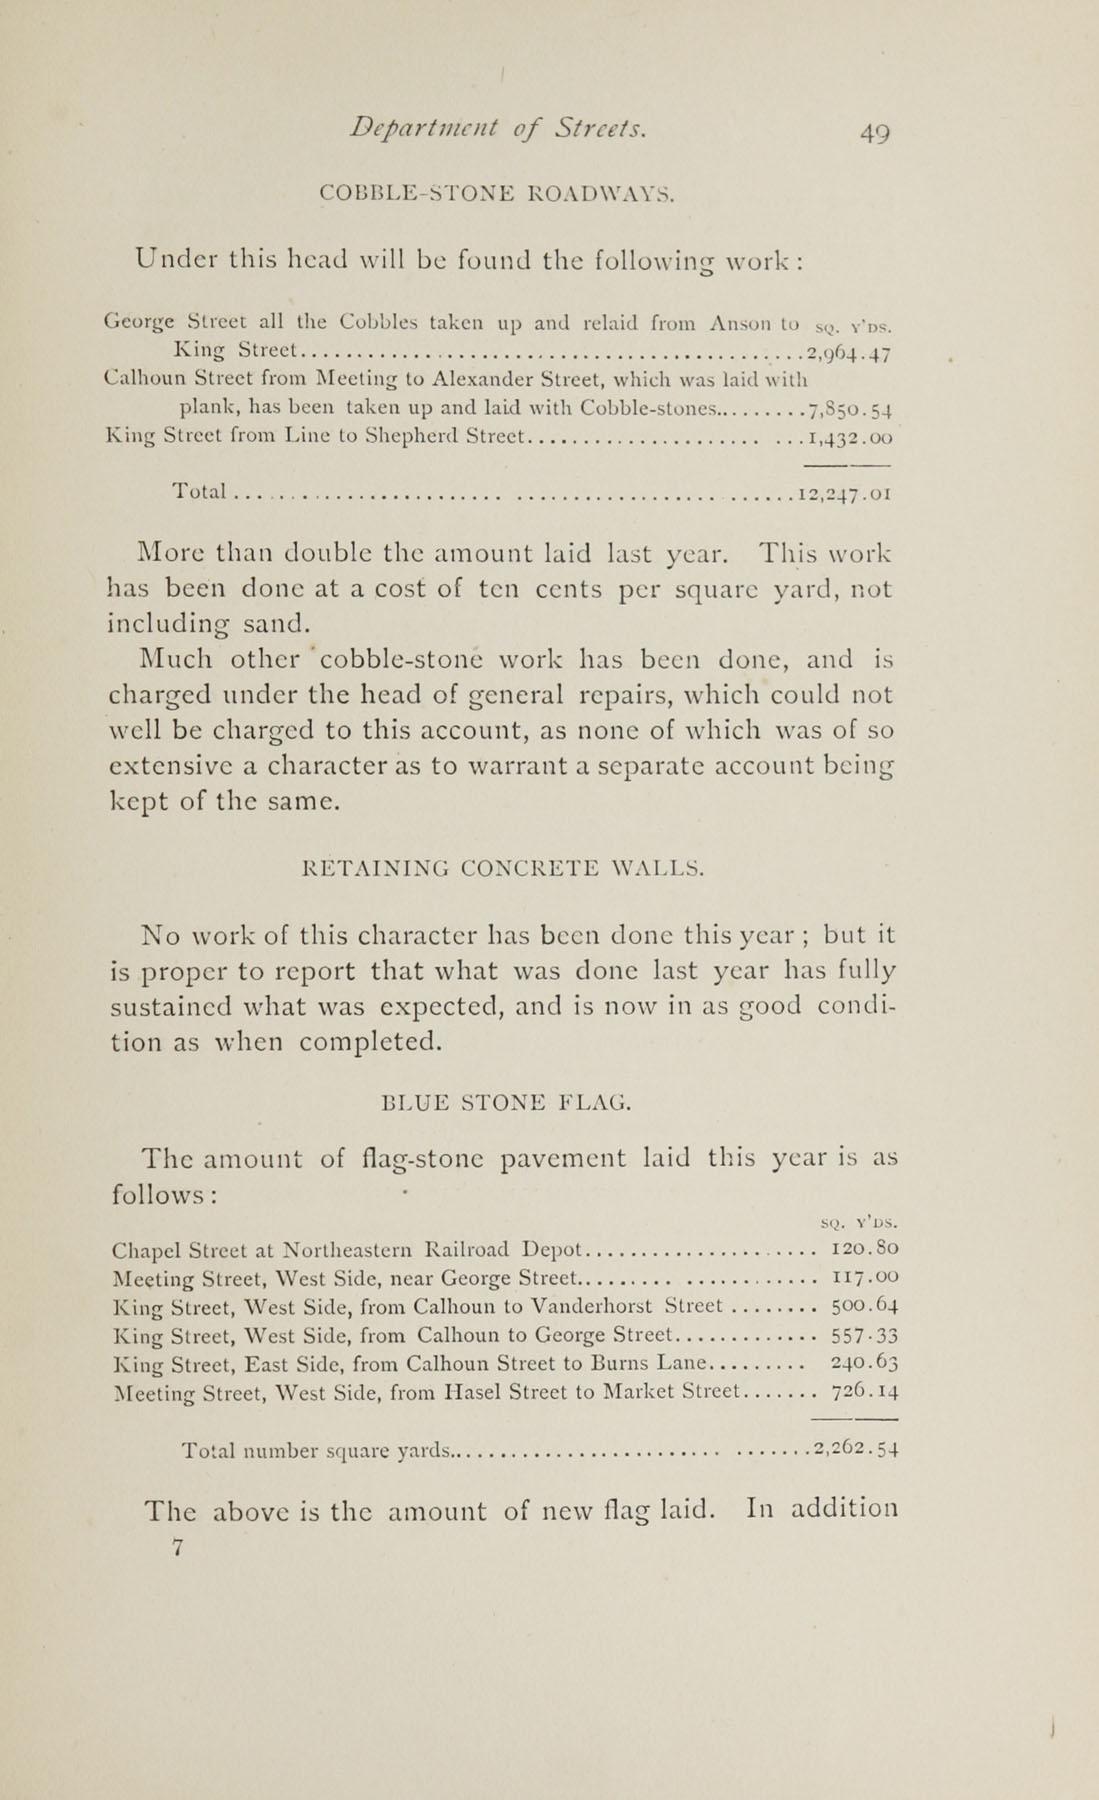 Charleston Yearbook, 1882, page 49